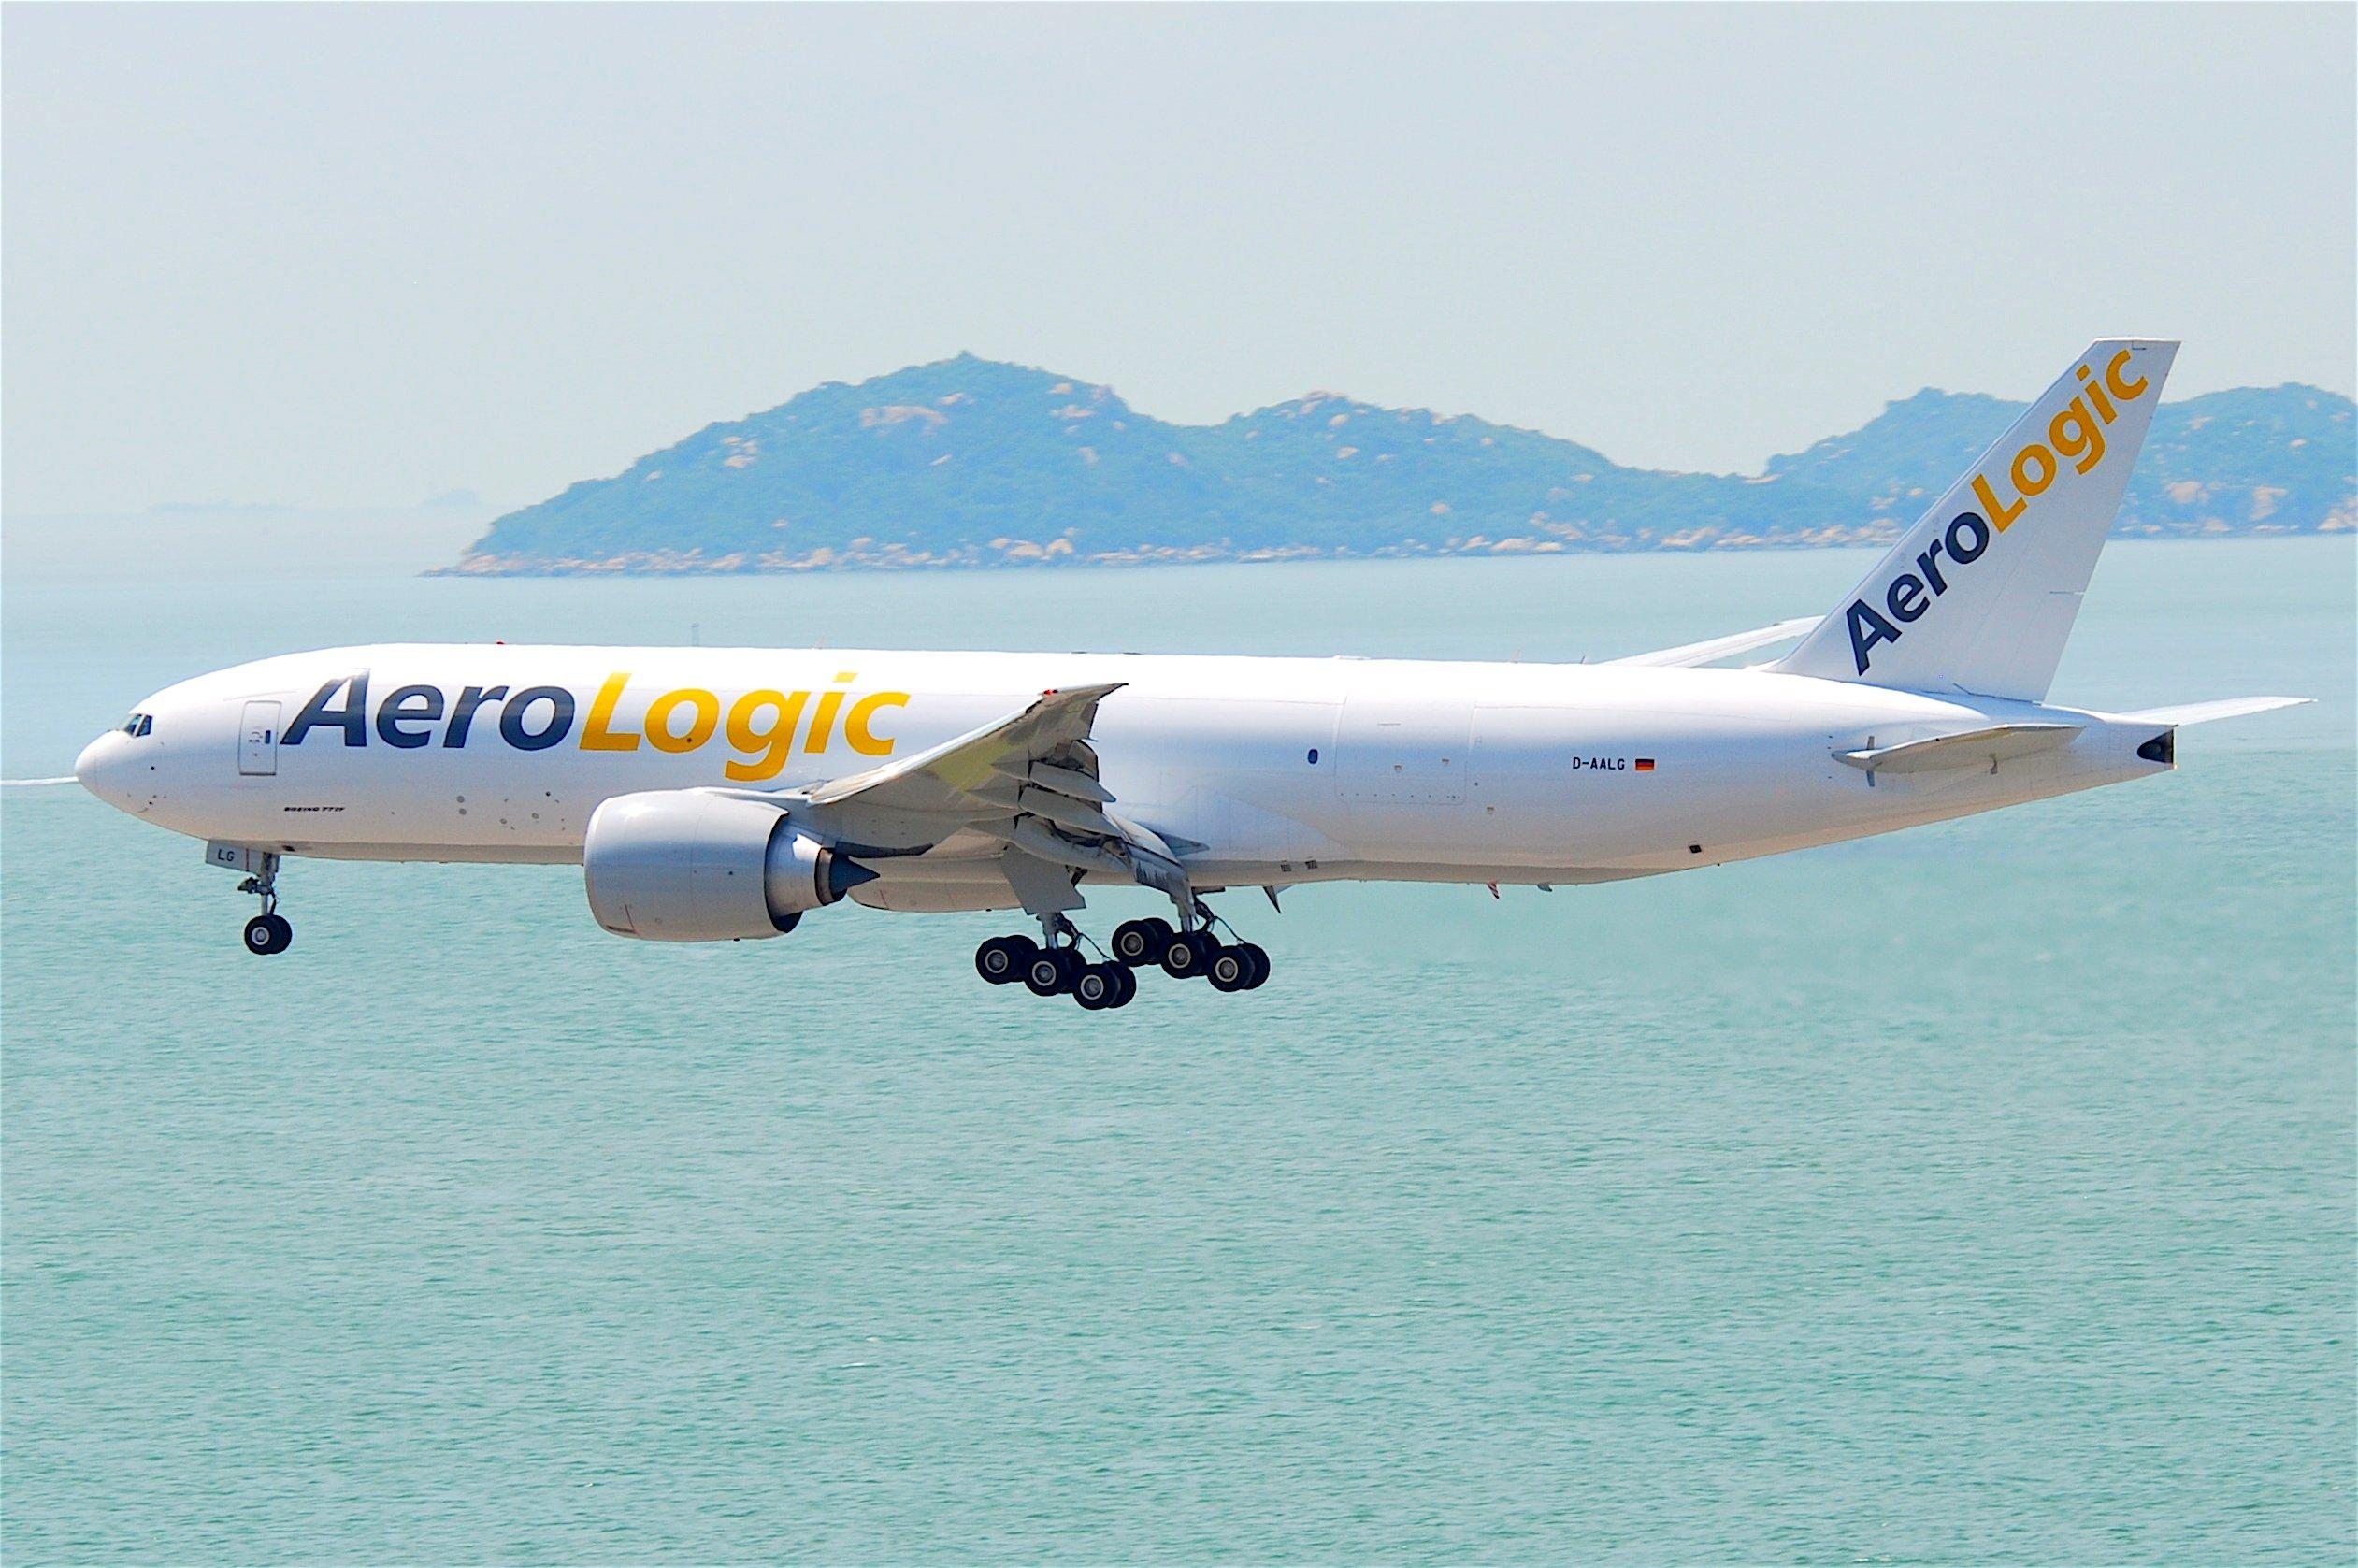 Aerologic 777